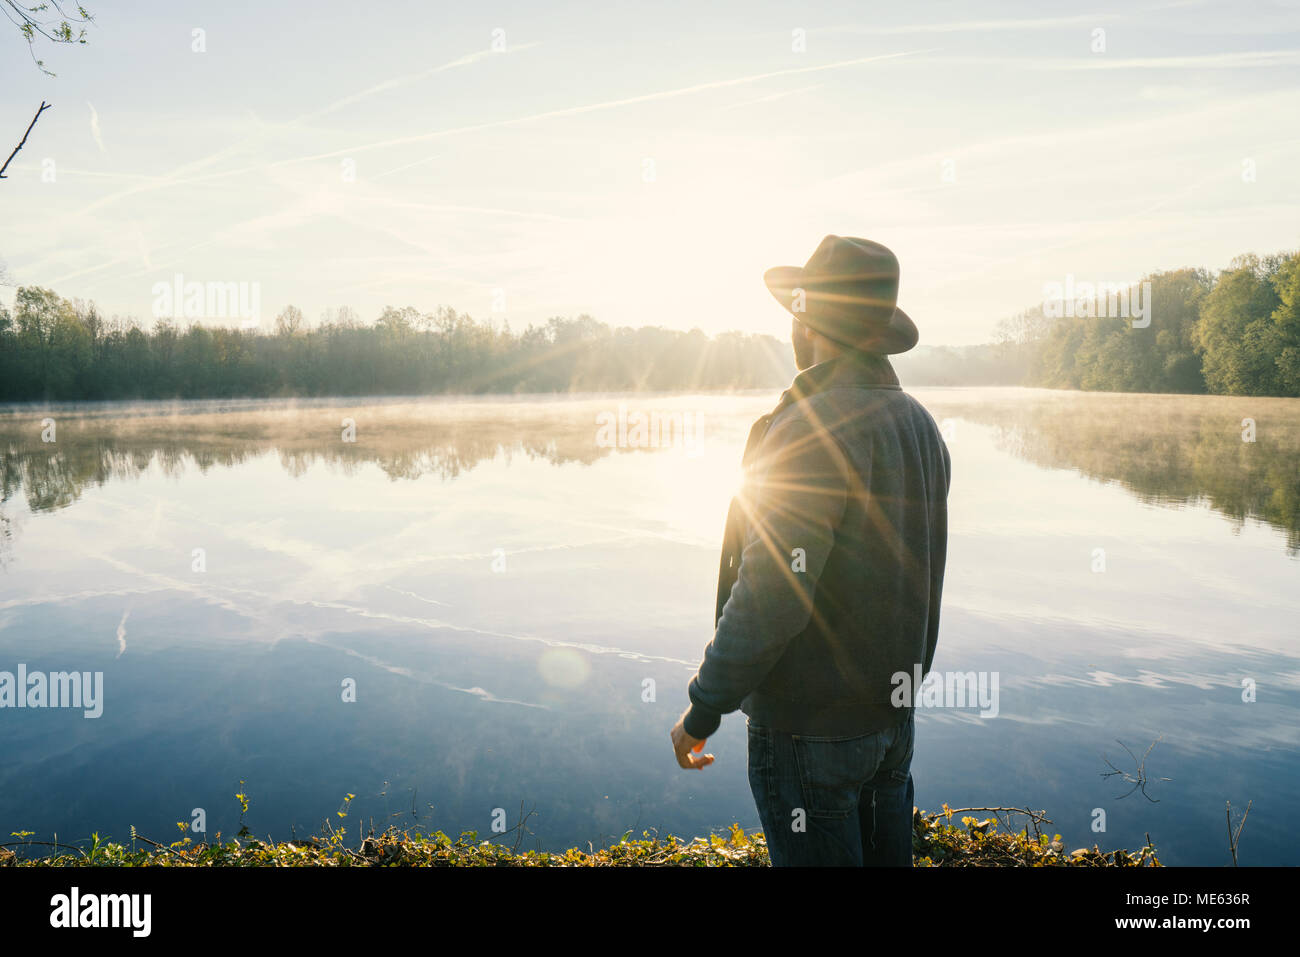 Junger Mann Art der Betrachtung durch den See bei Sonnenaufgang, Frühling, Frankreich, Europa. Menschen reisen, Entspannung in der Natur. Getonten Bild Stockbild